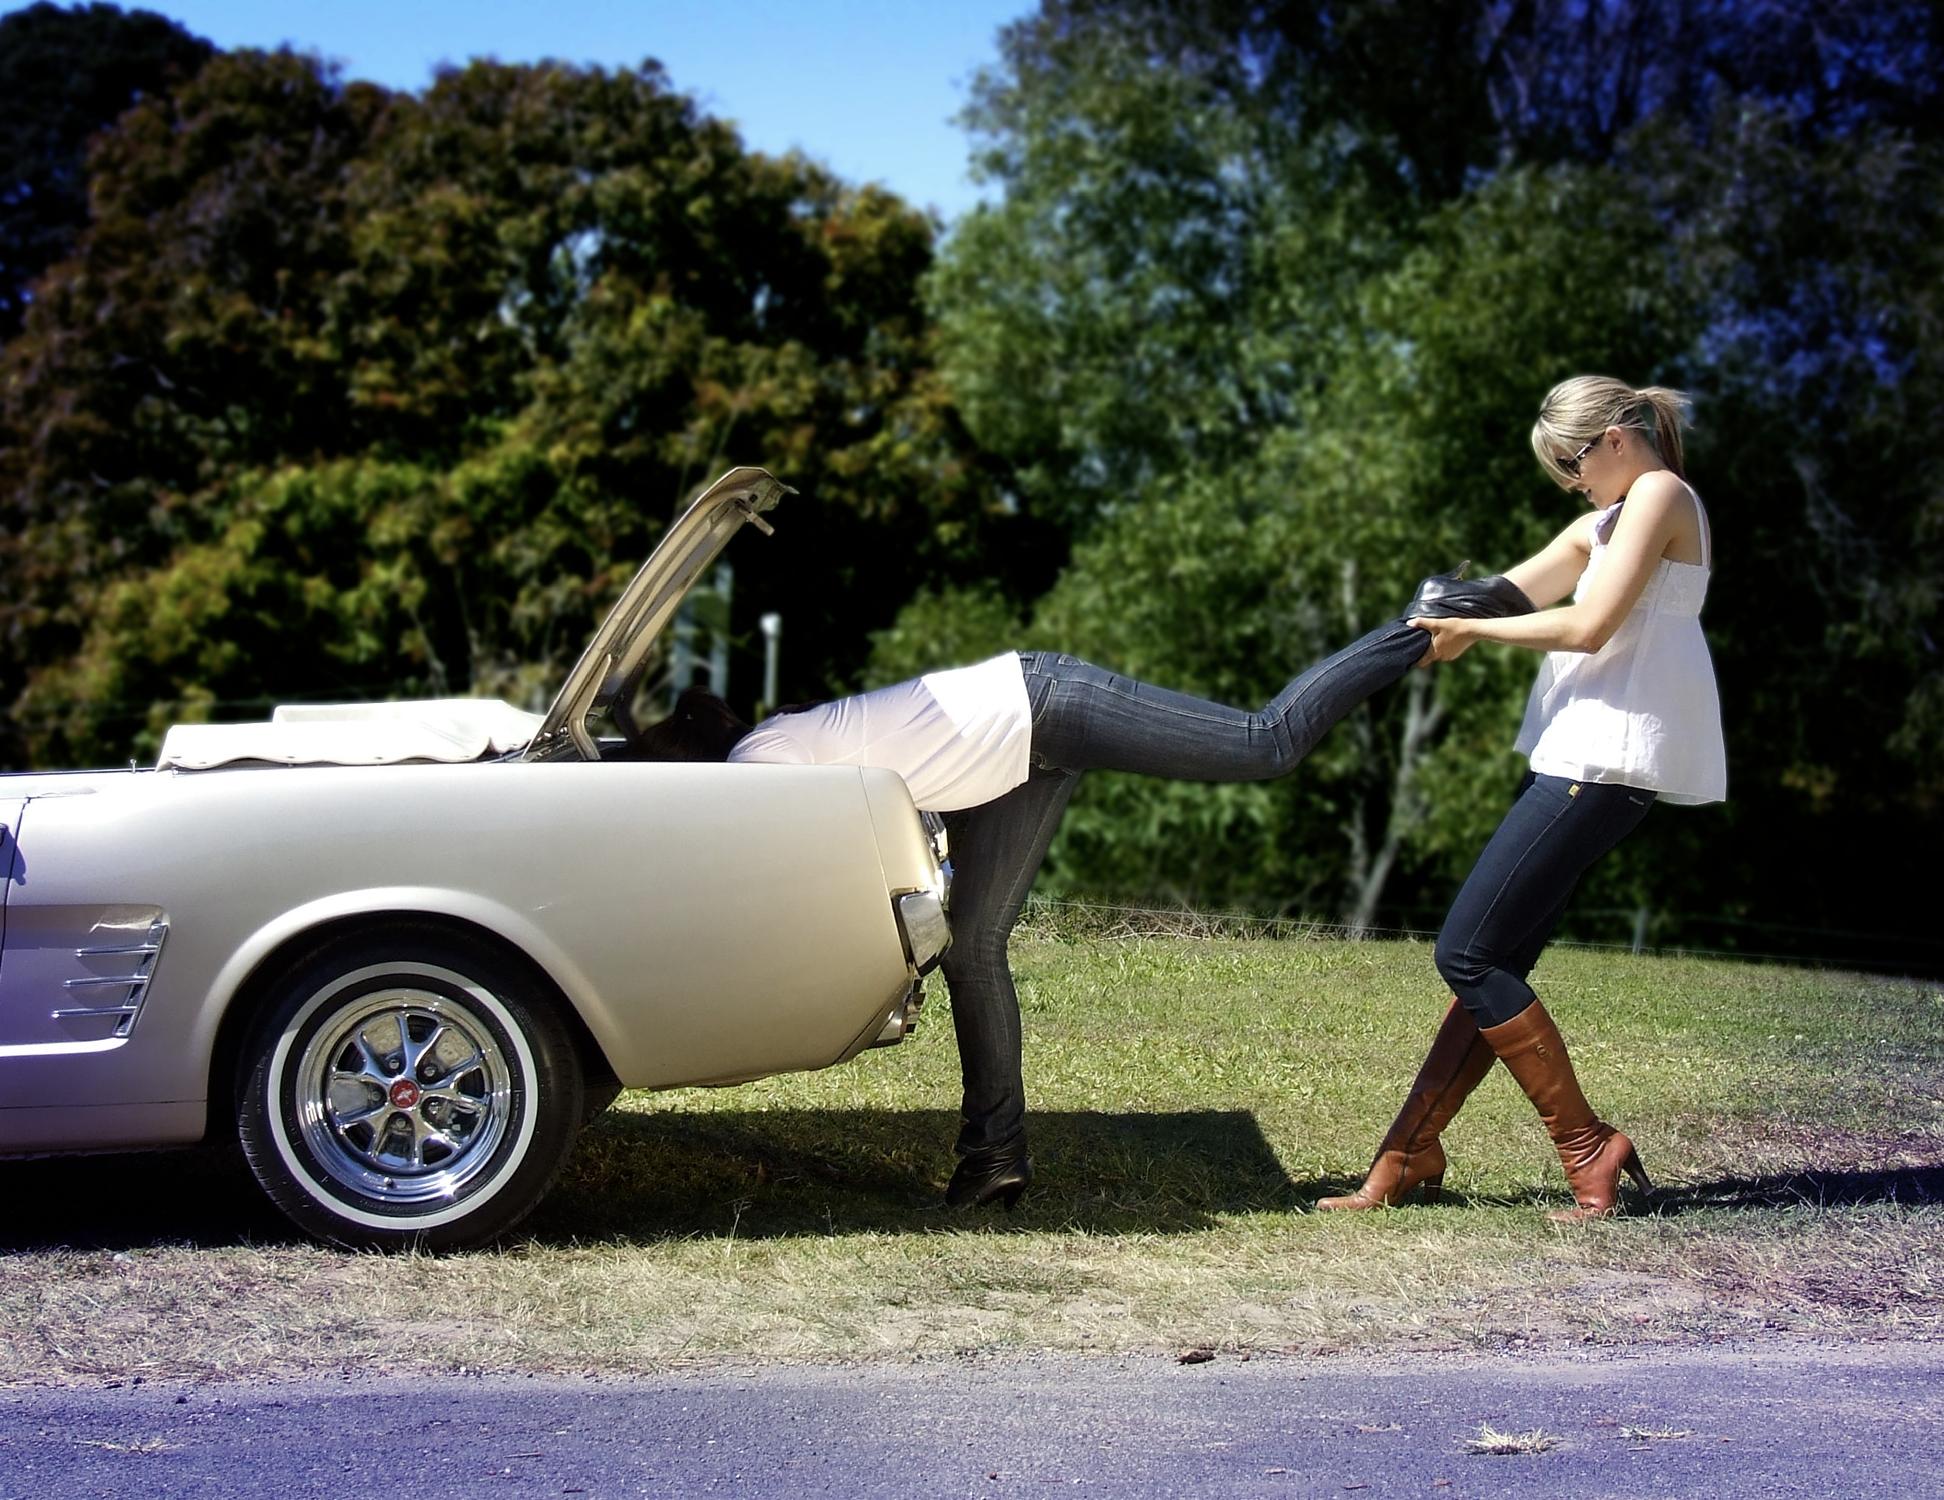 Mustang-hungryboot.jpg